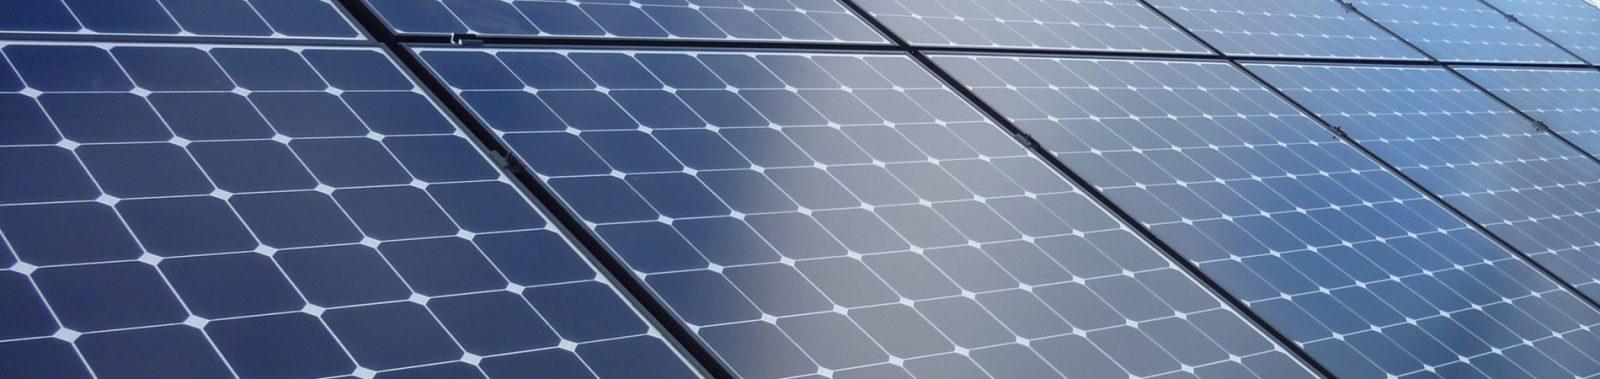 Solar Panels Upclose Hero Slider